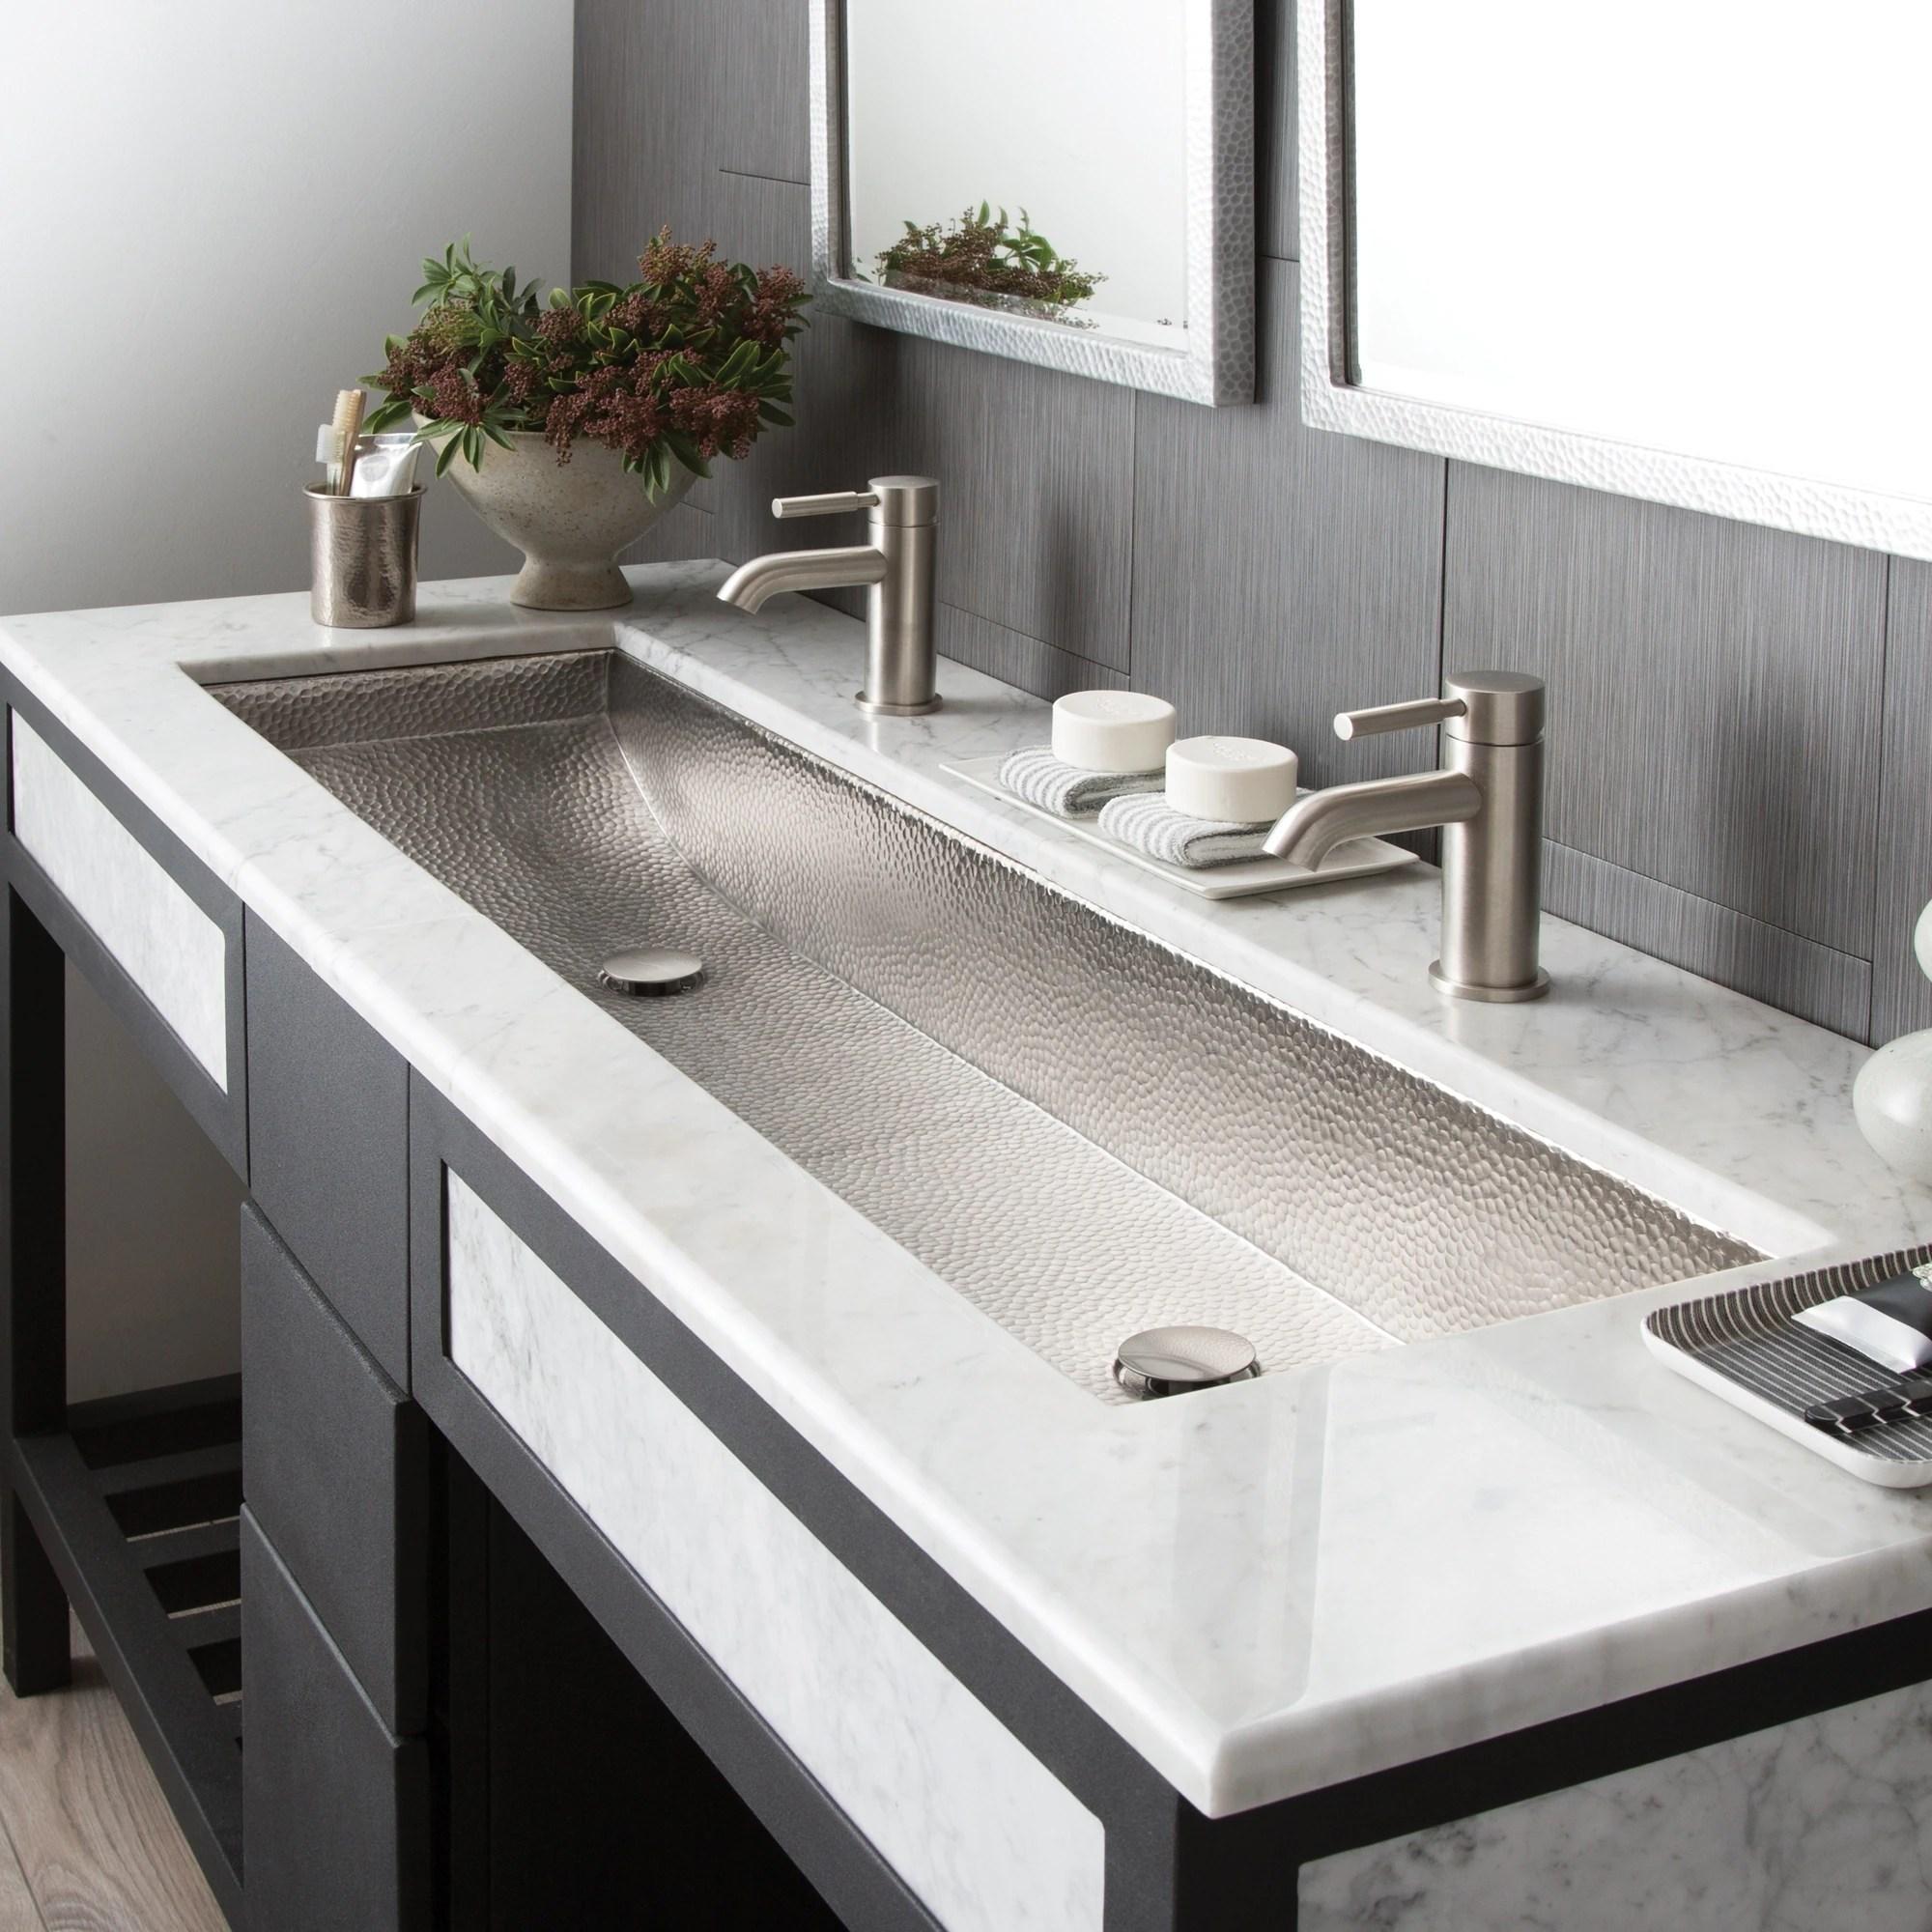 trough brushed nickel 48 inch undermount drop in bathroom sink 48 x 14 x 6